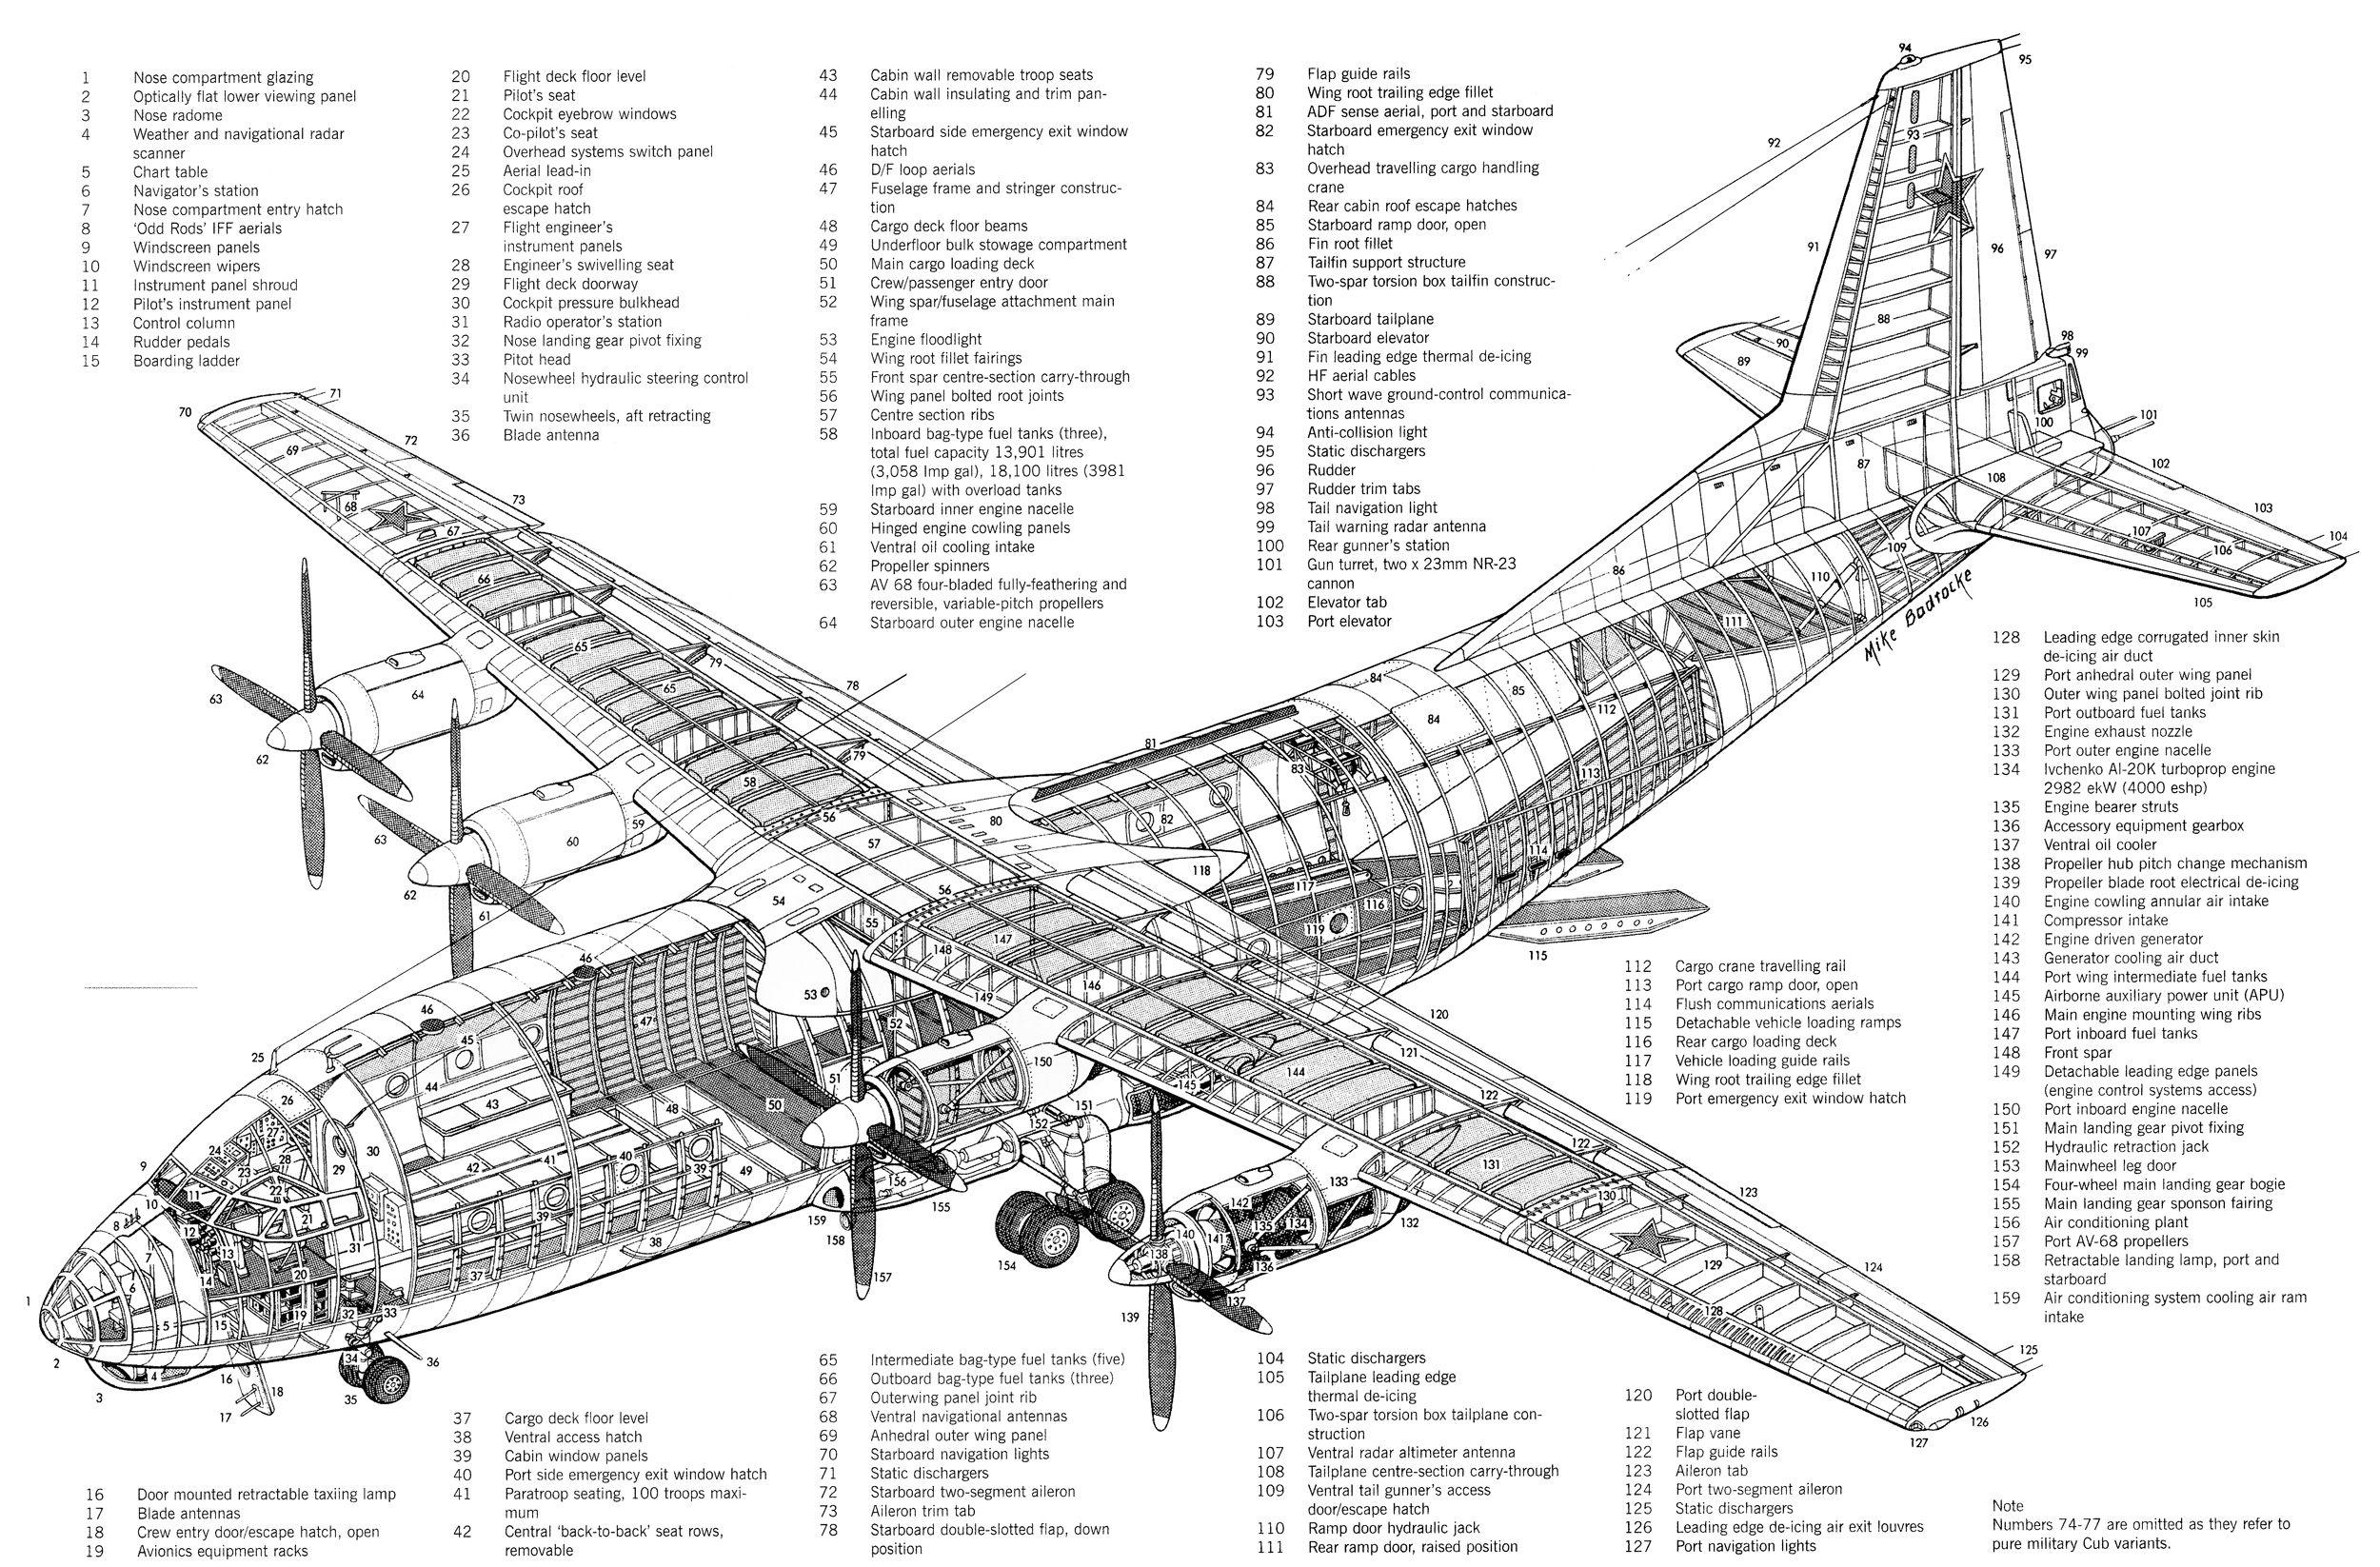 Cutaways Cortes Esquemticos De Aviones Pgina 82 Zona